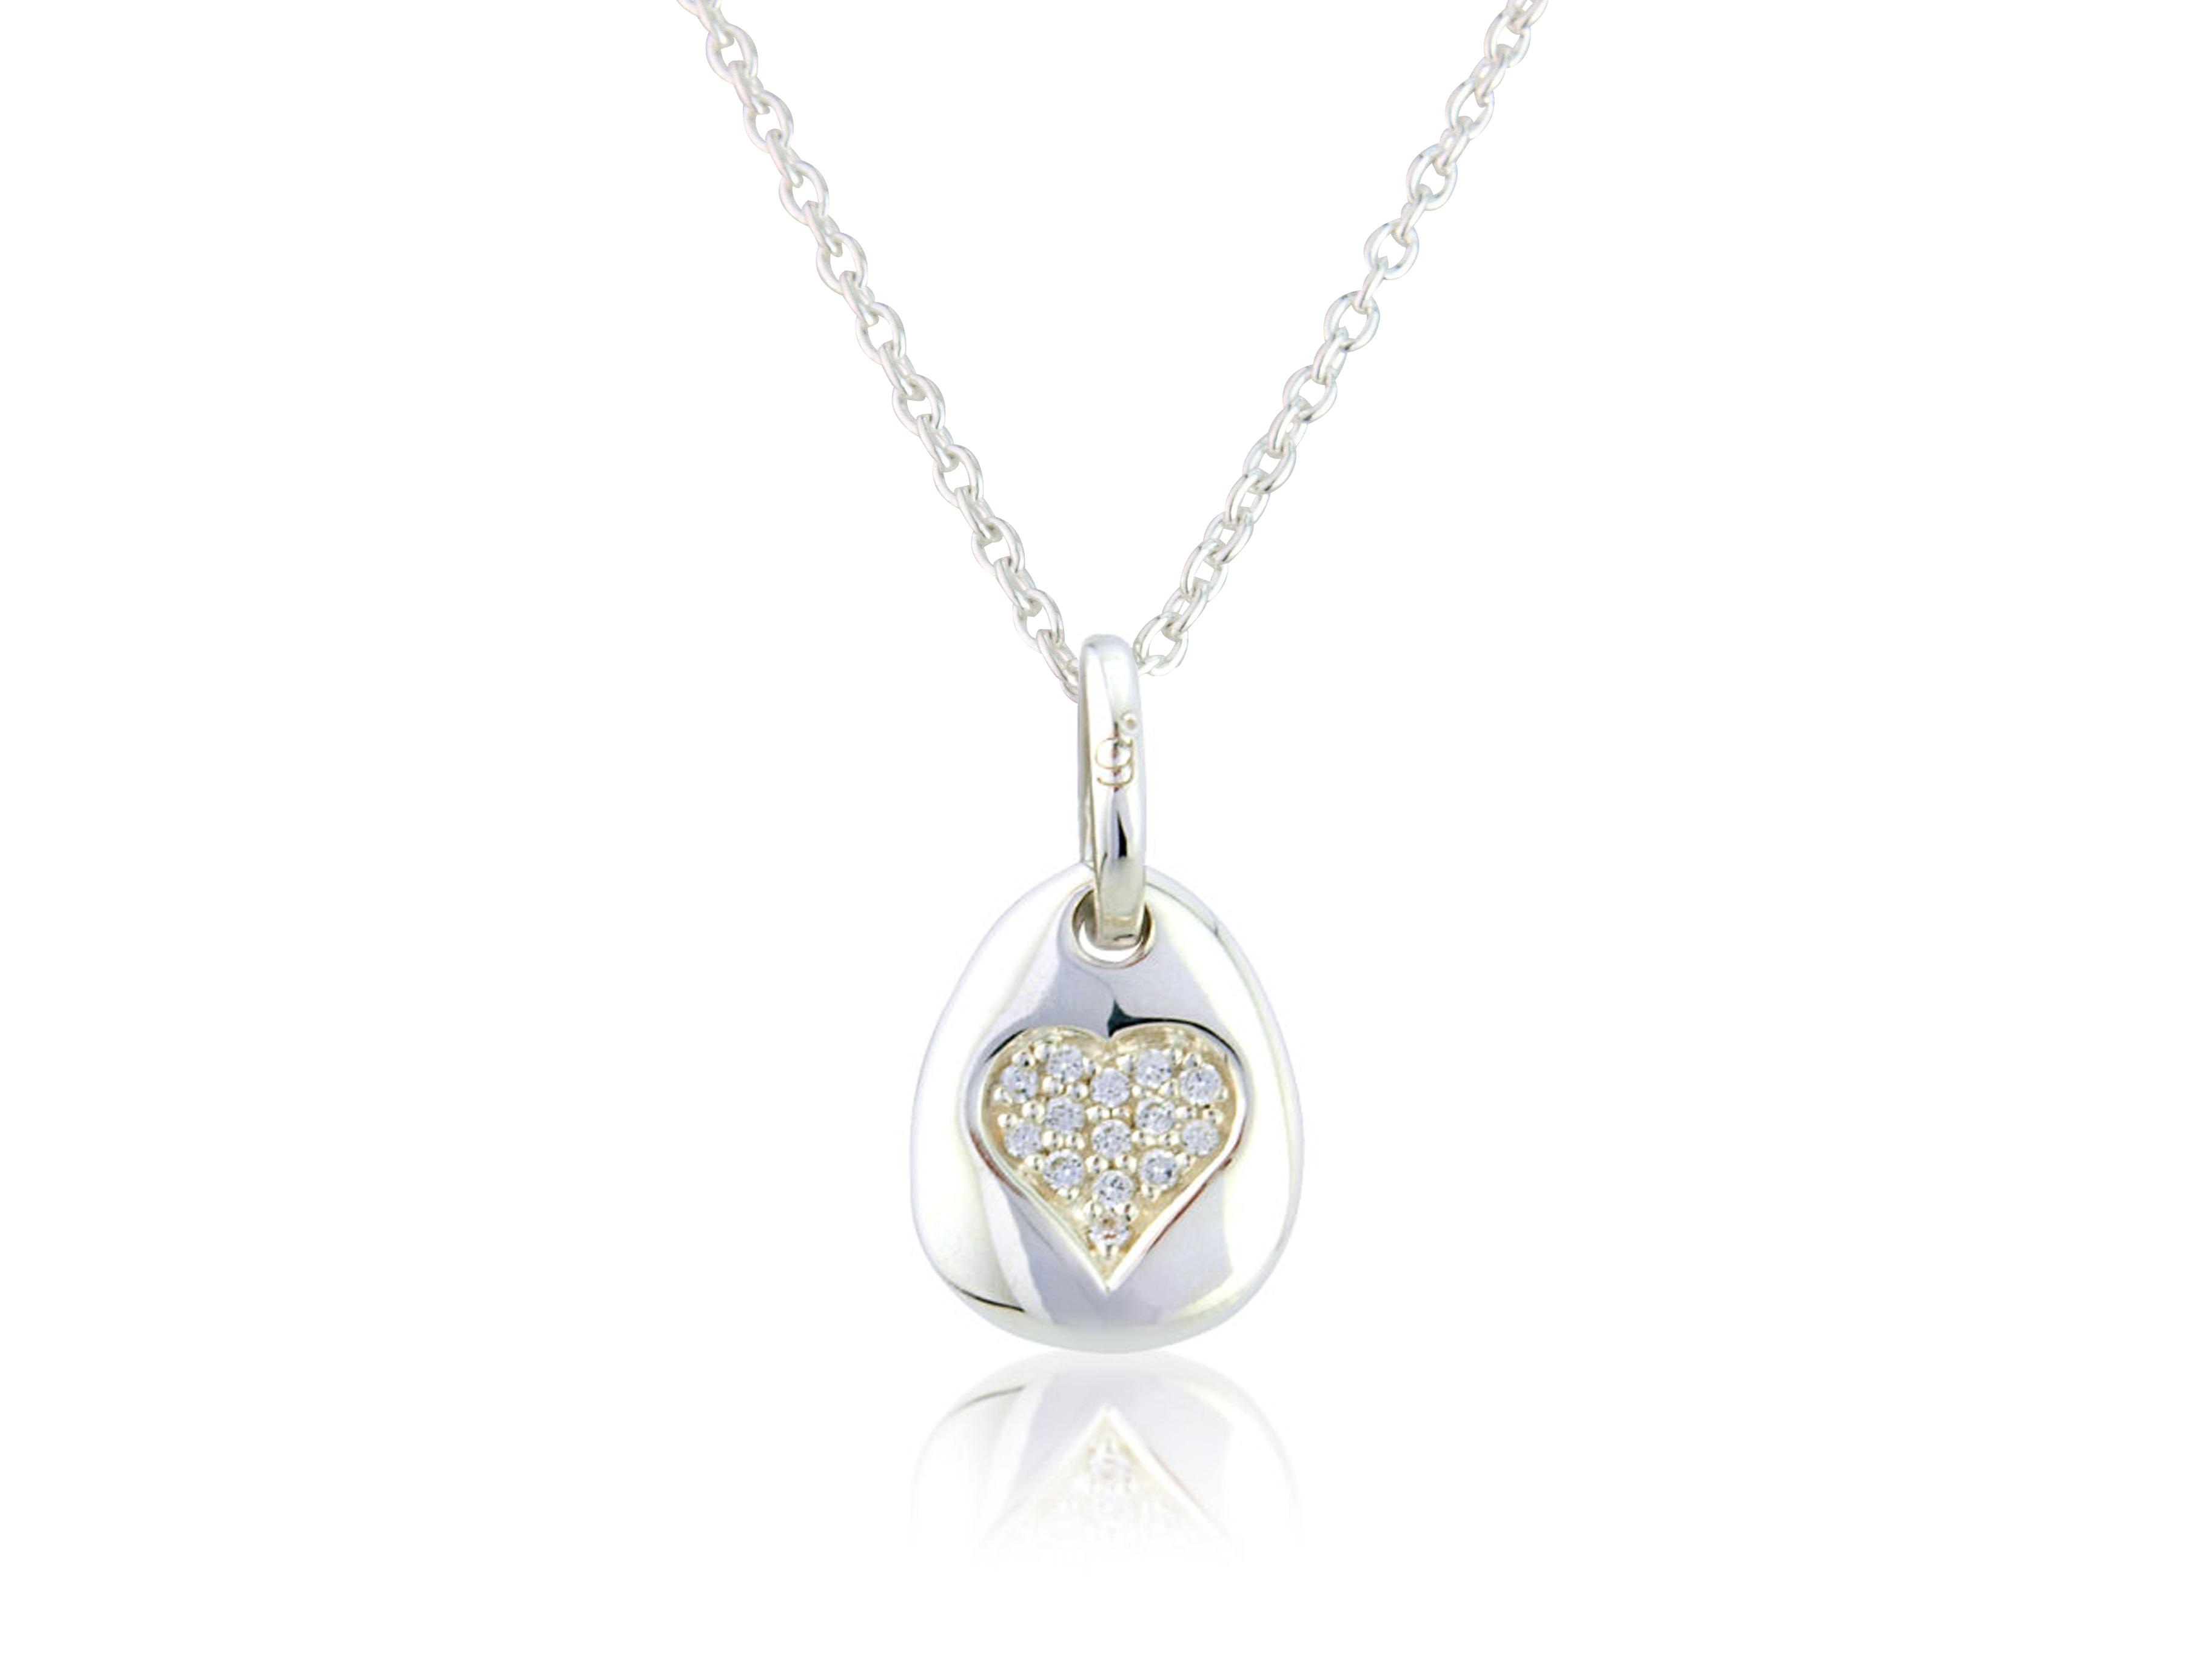 Sparkly Heart Pebble Pendant